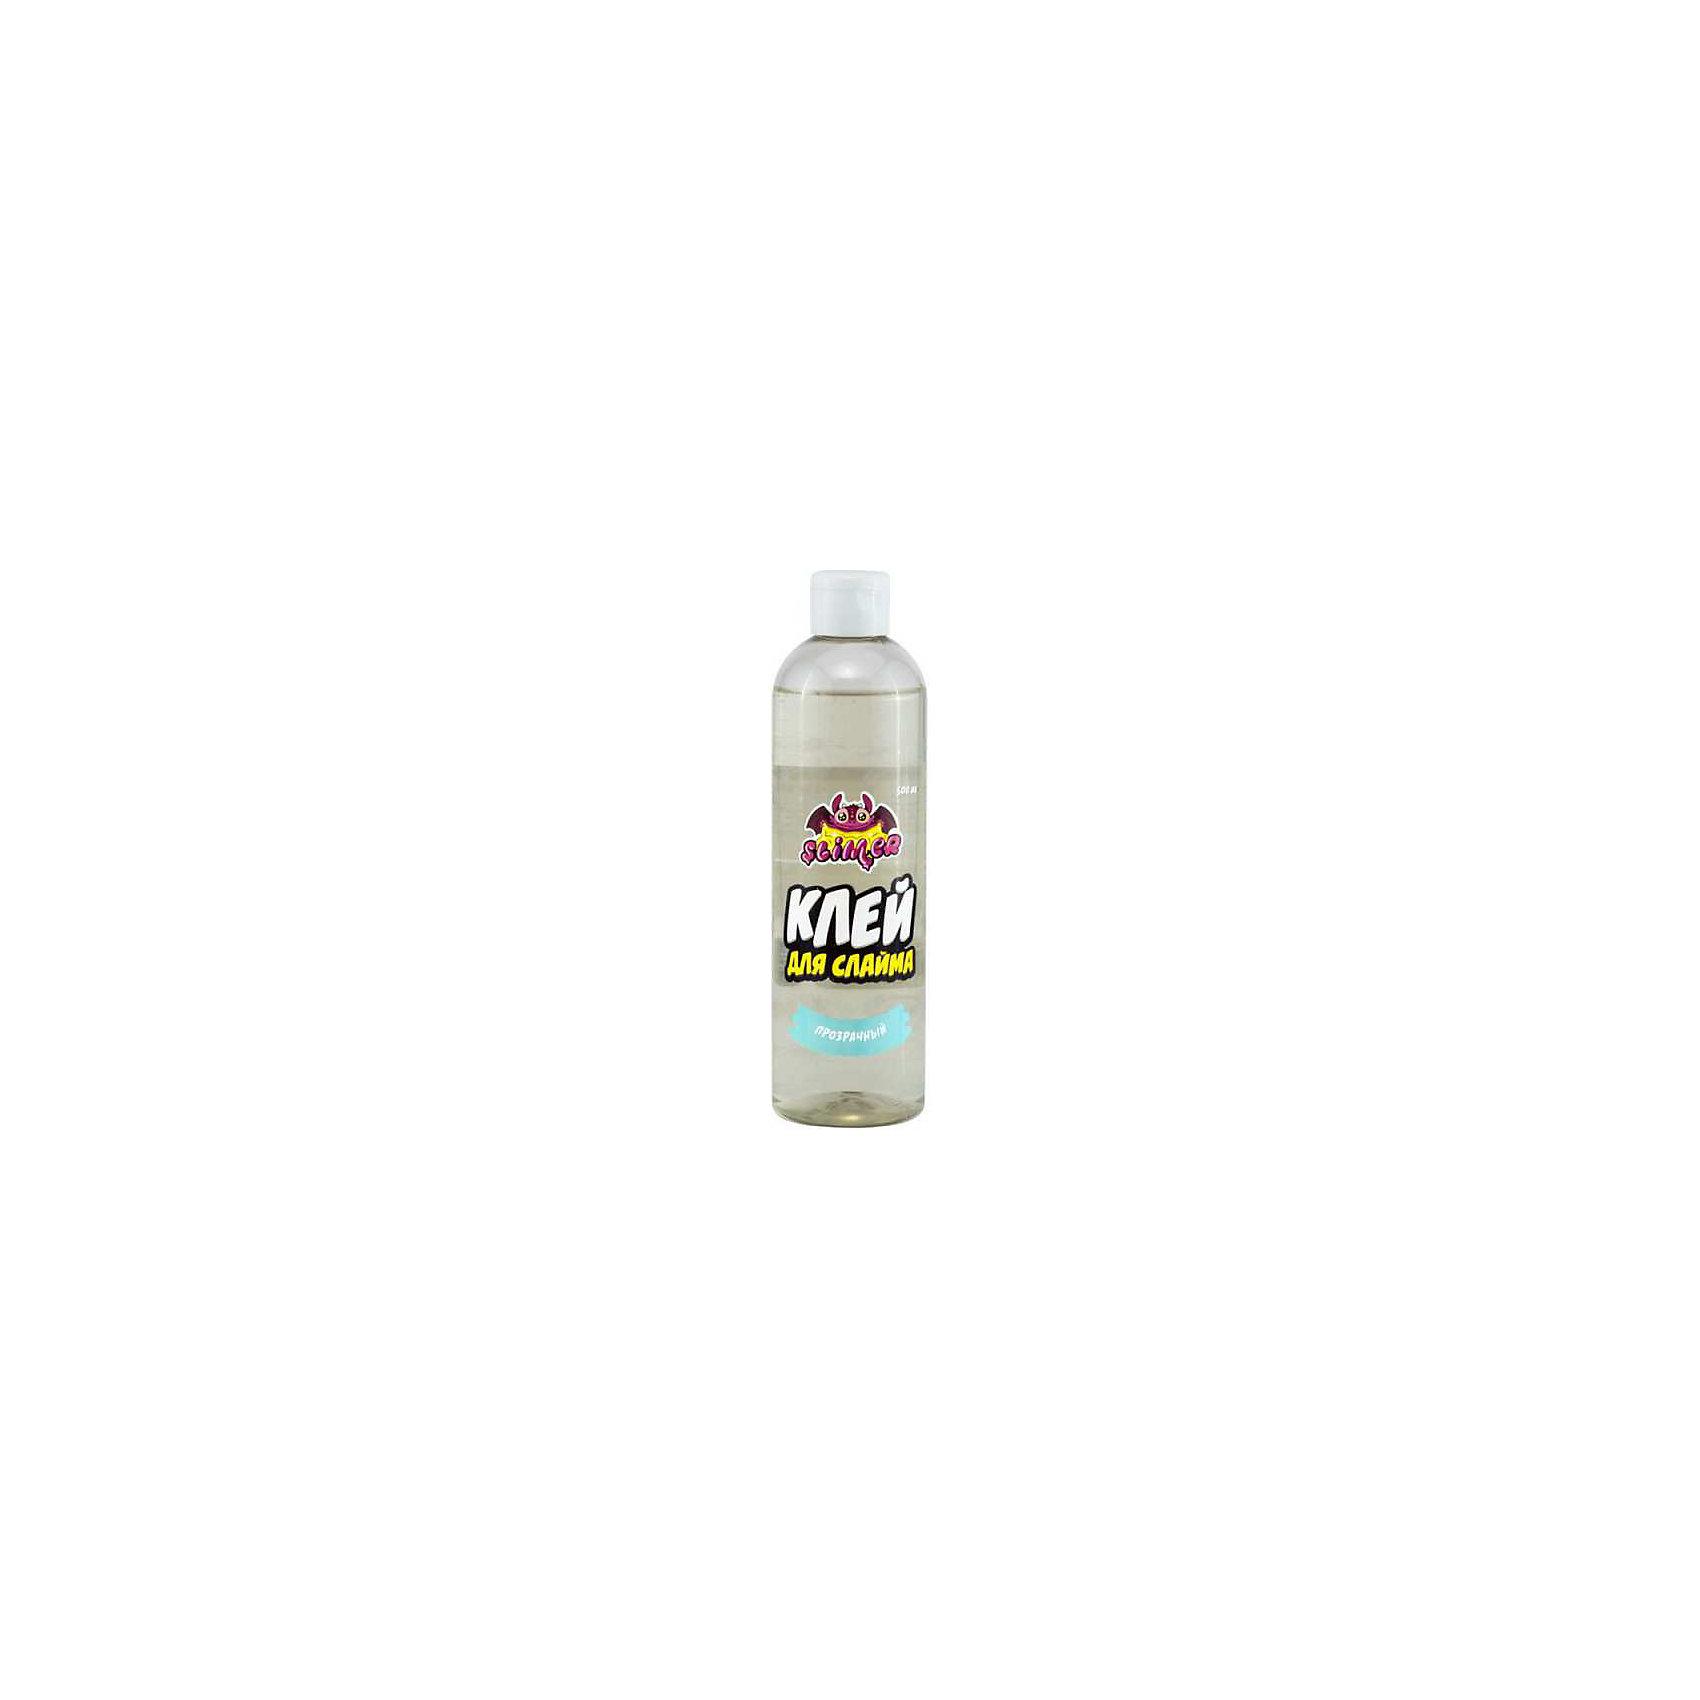 Slimer | Канцелярский клей для слаймов Slimer, 500 мл | Clouty